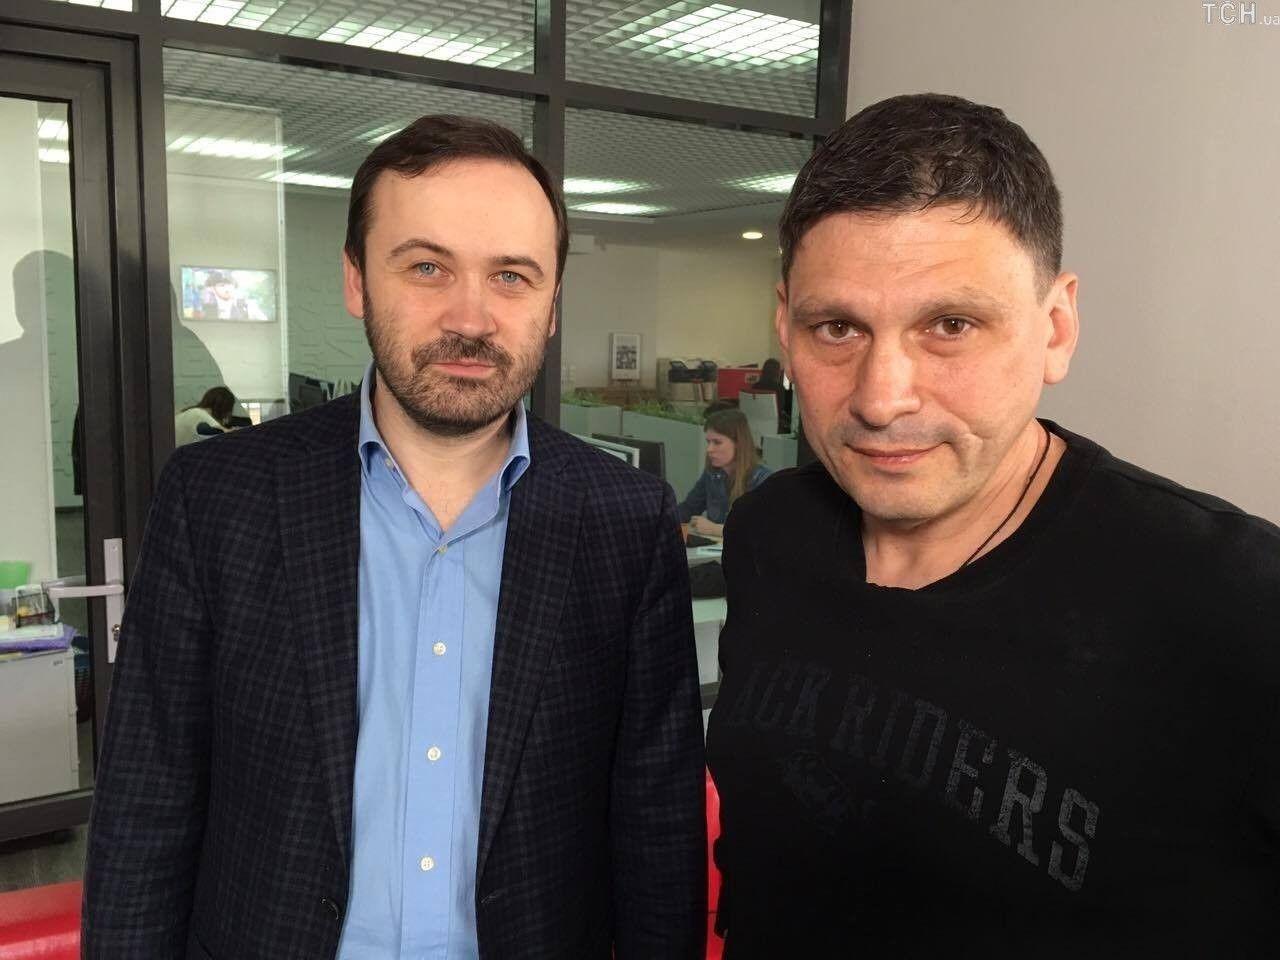 Ілля Пономарьов і Андрій Цаплієнко